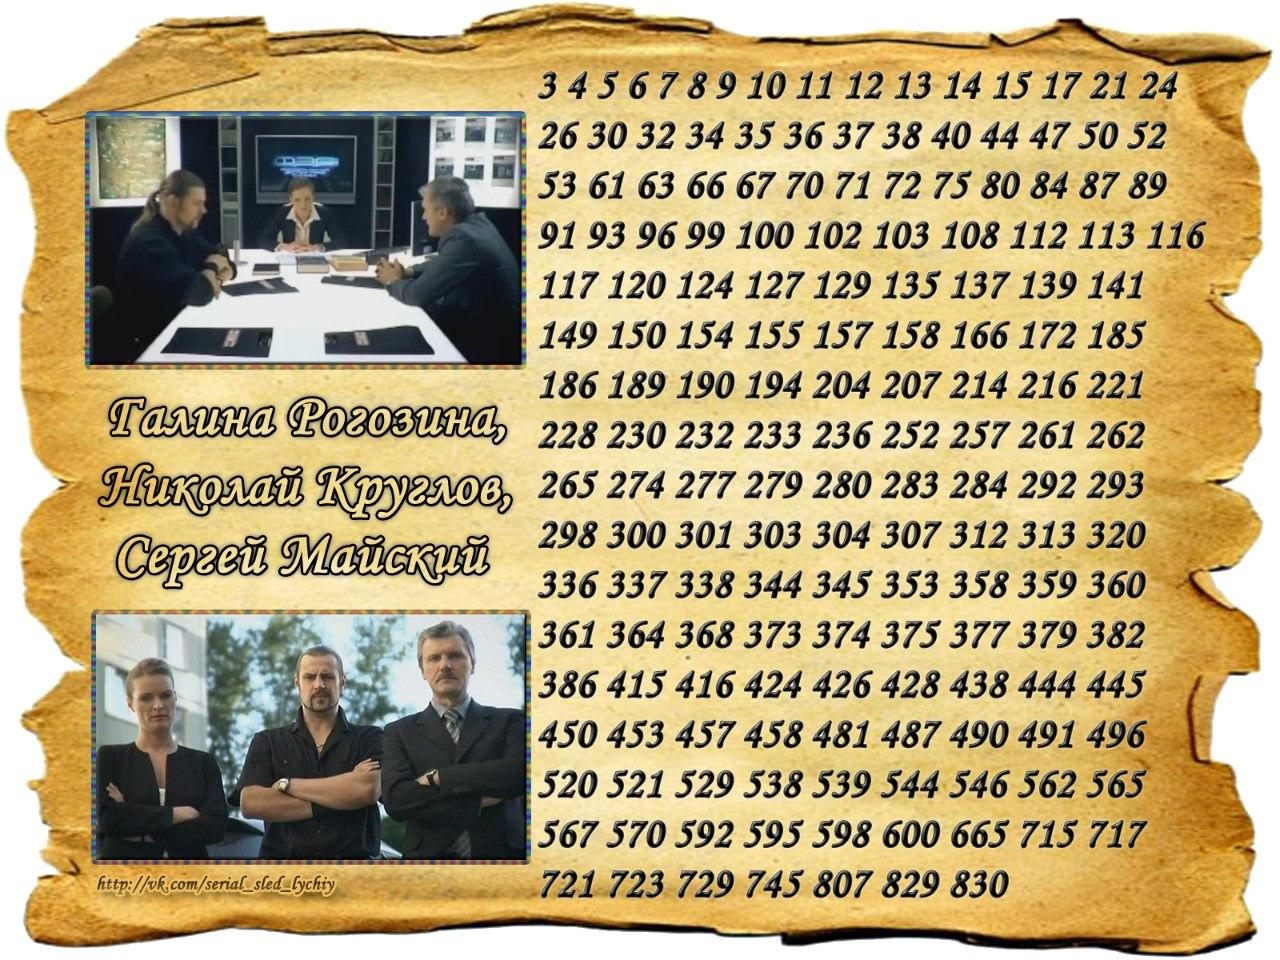 Оперативный состав в картинках UgWhY-BFJXQ